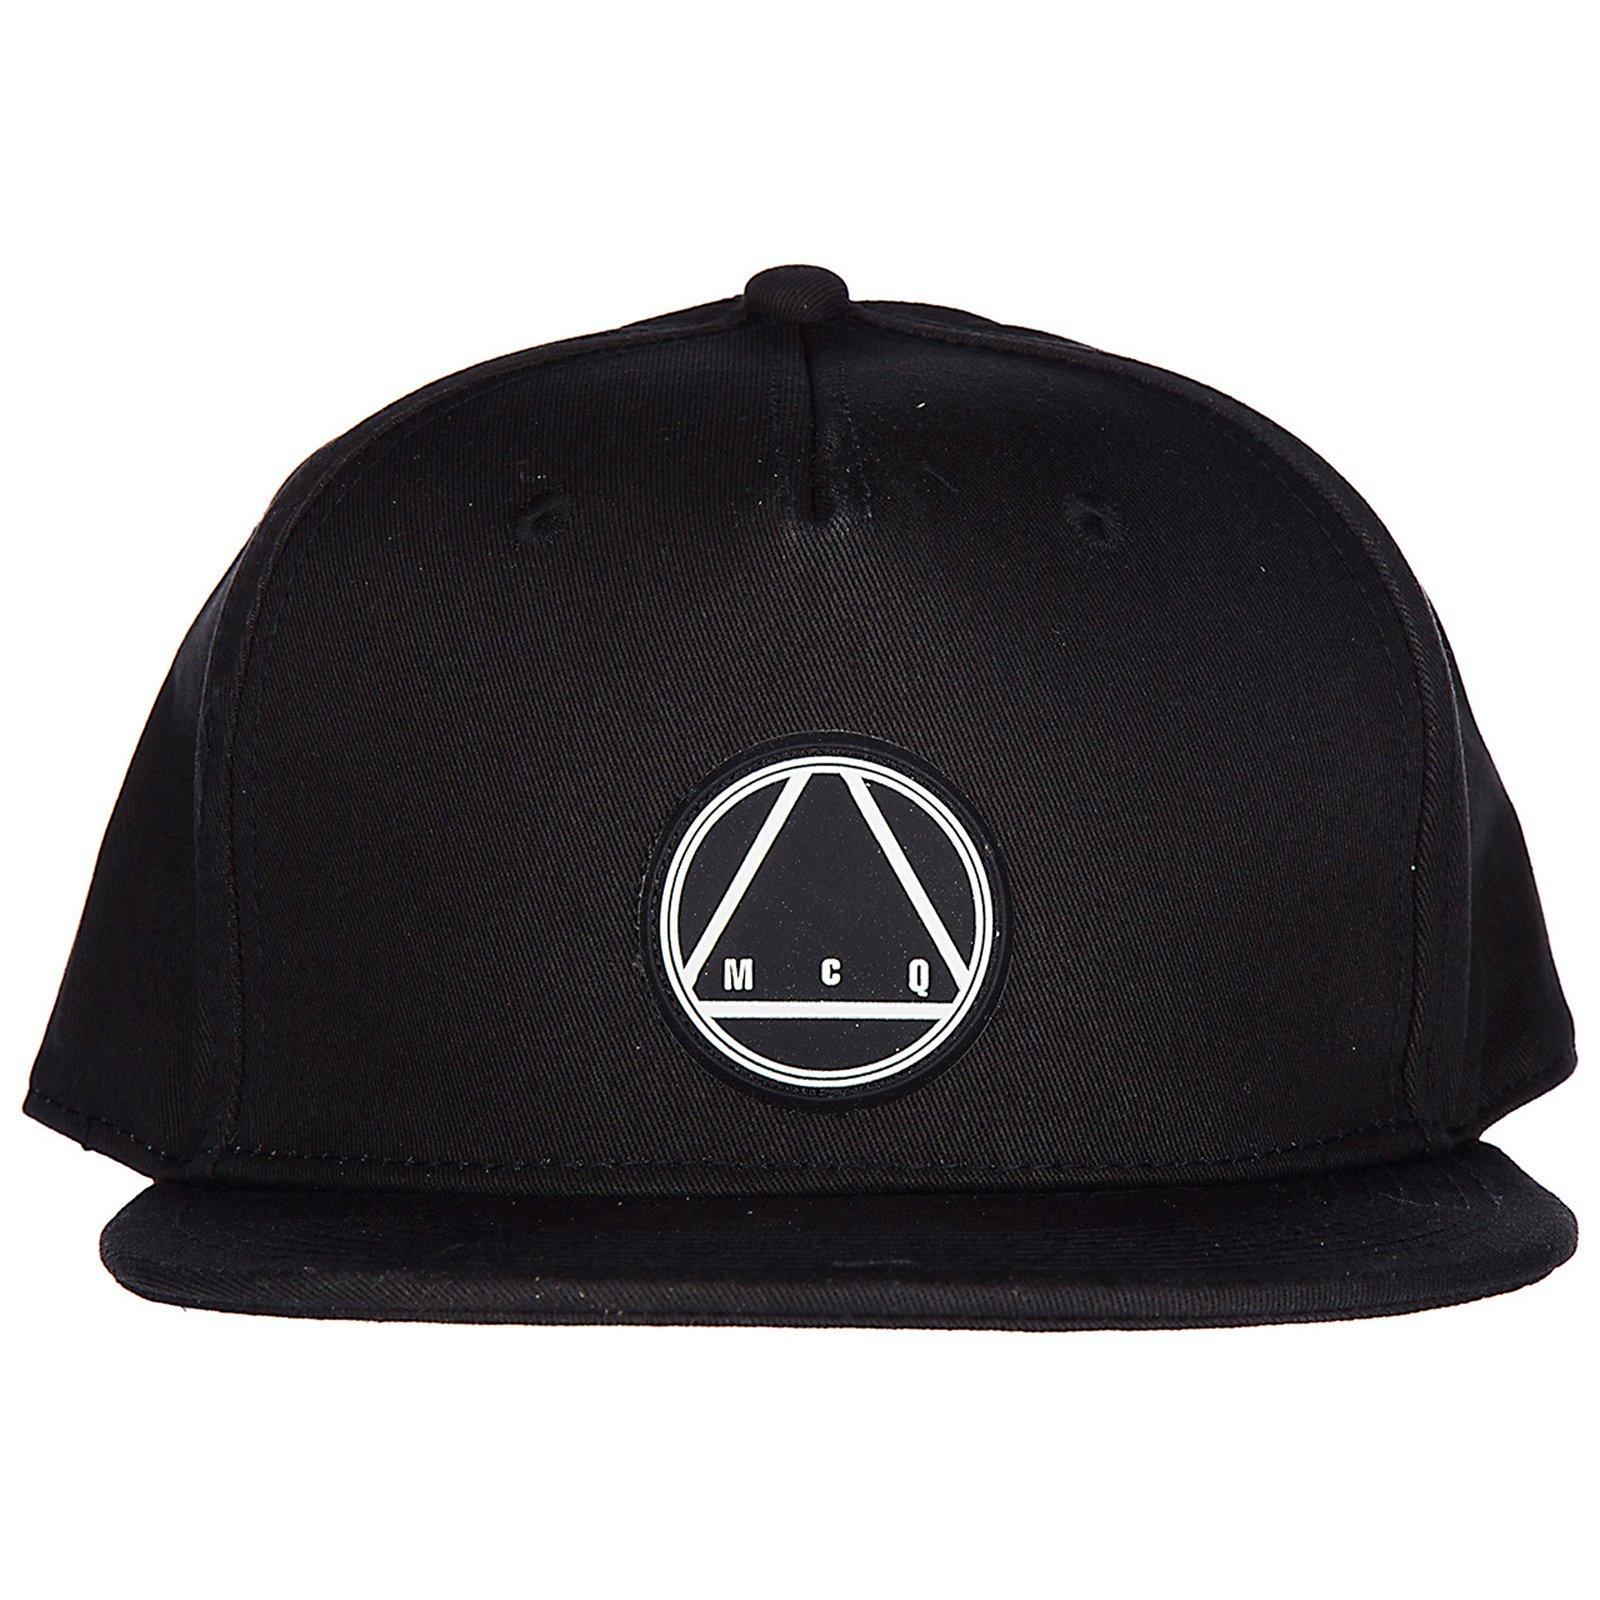 Mcq By Alexander Mcqueen Mcq Alexander Mcqueen Logo Patch Cap In Black